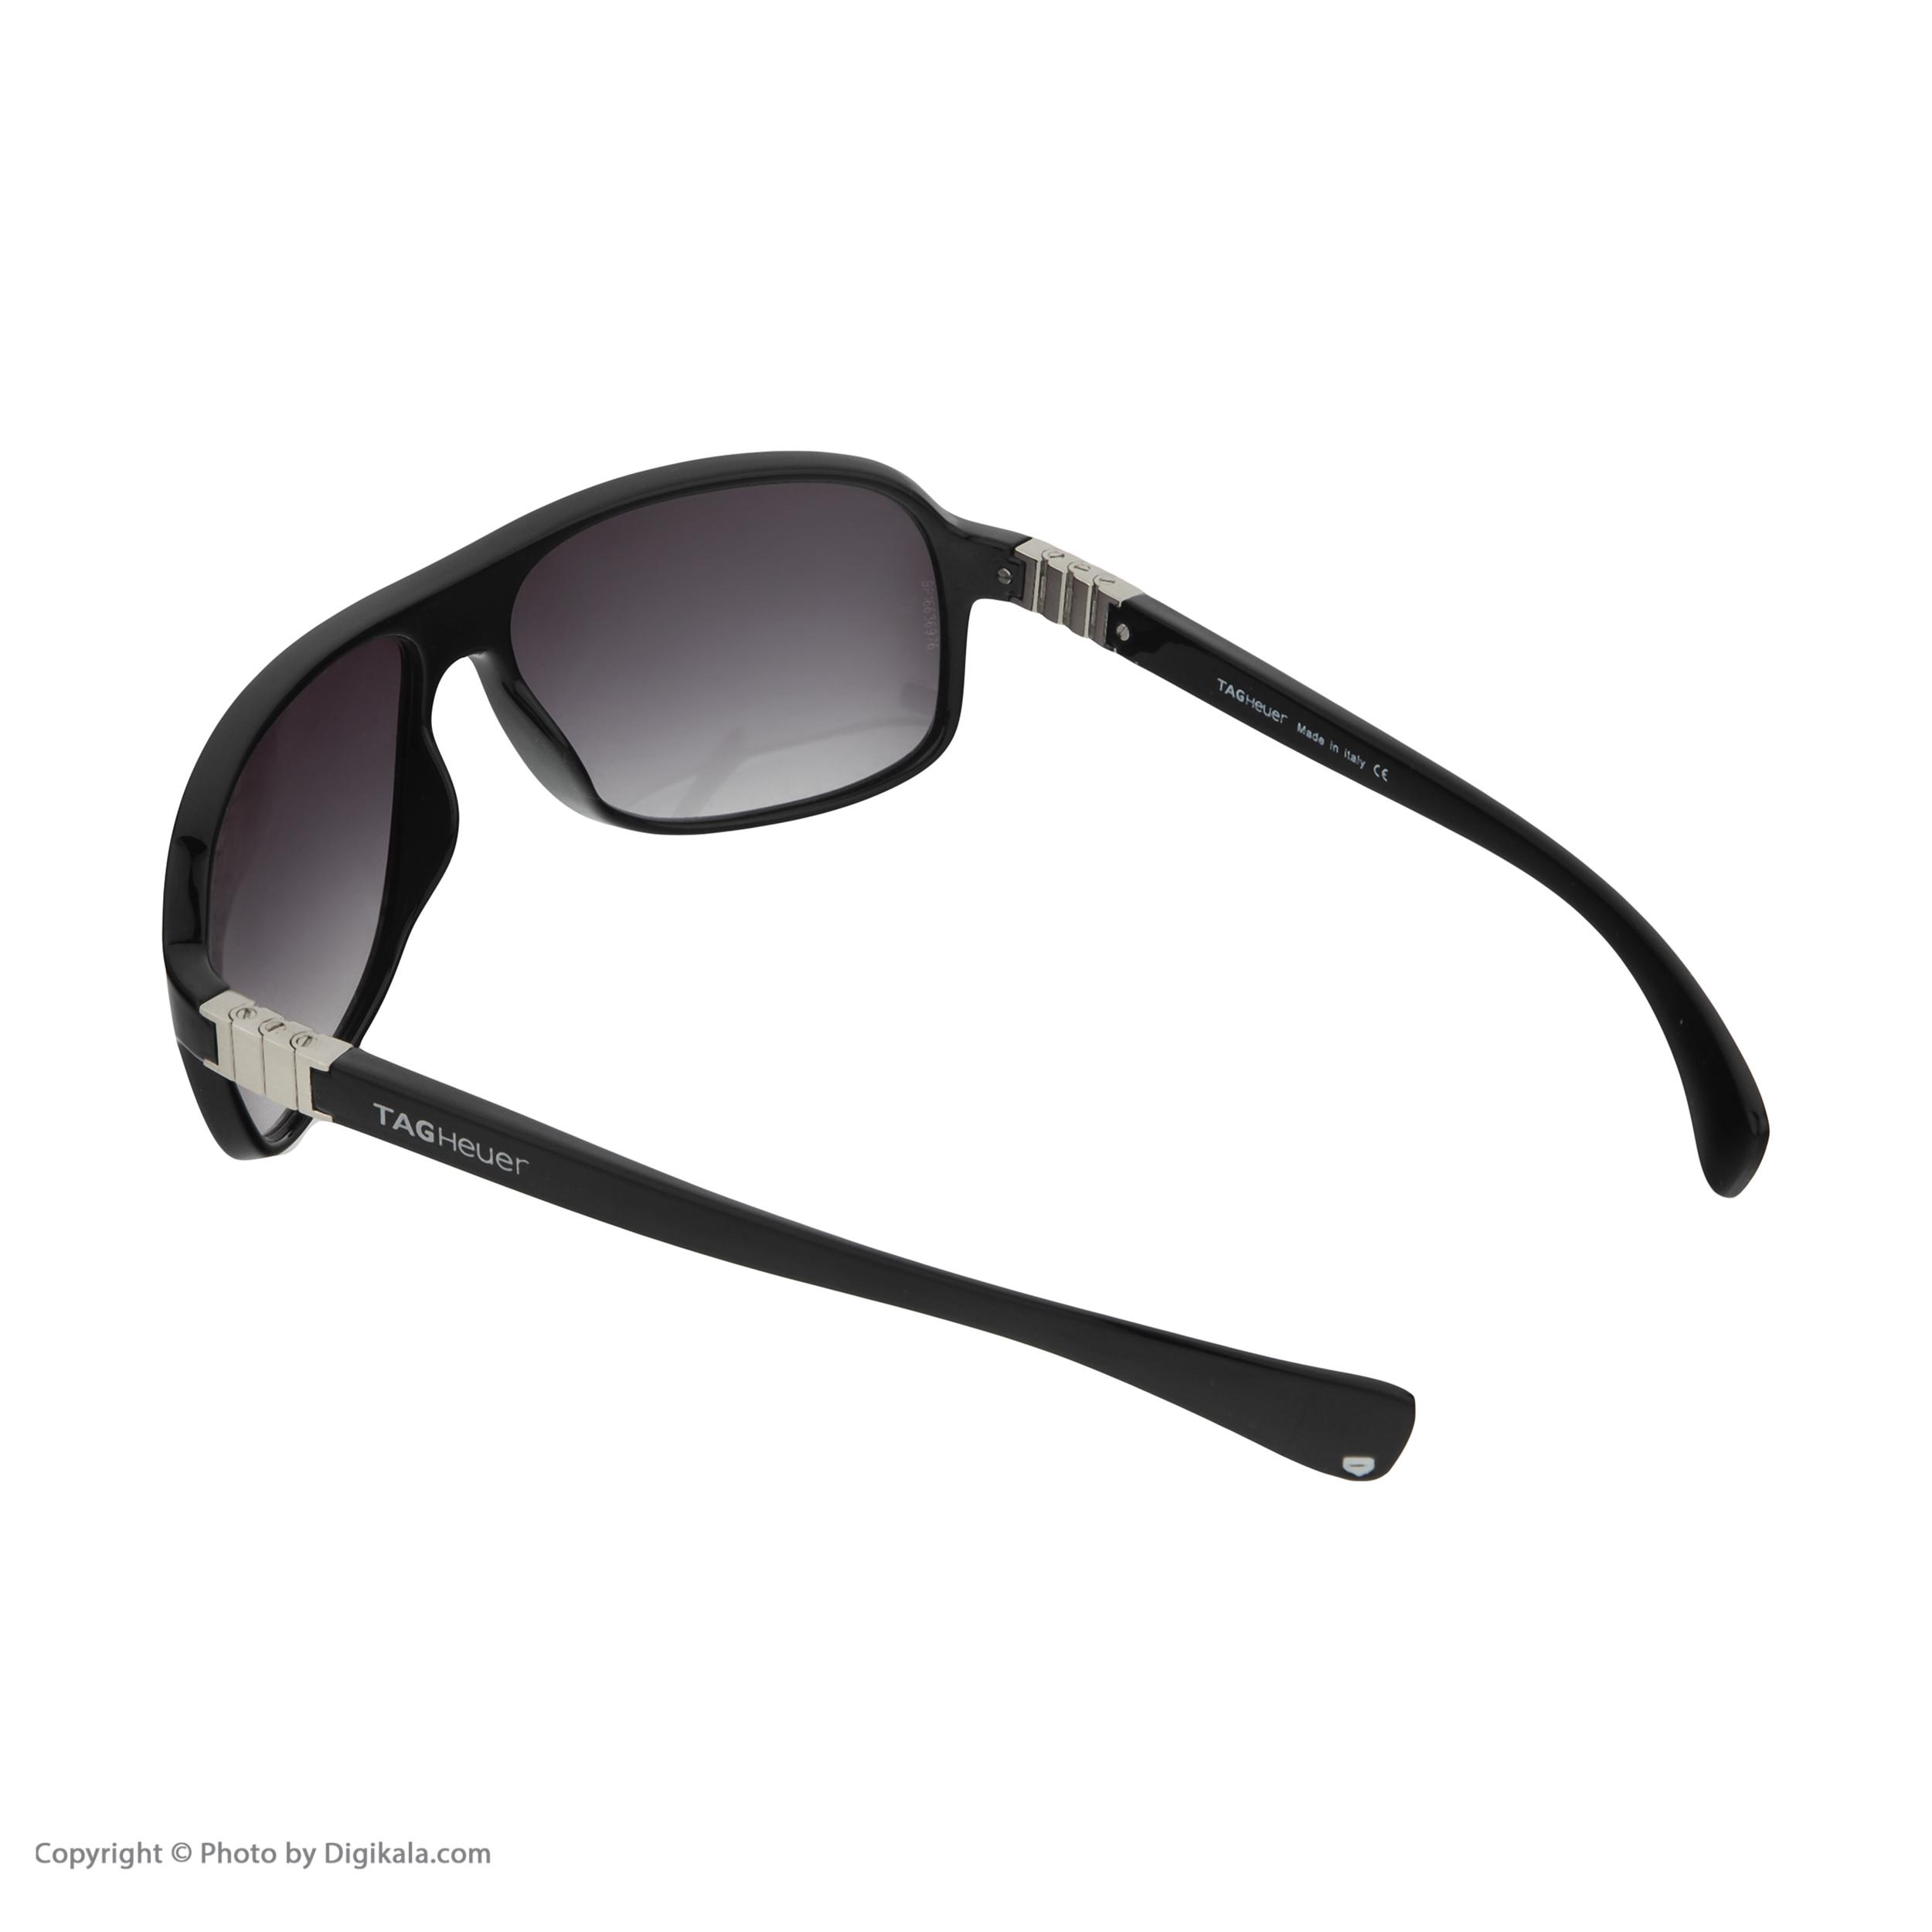 عینک آفتابی تگ هویر مدل 9301 -  - 3